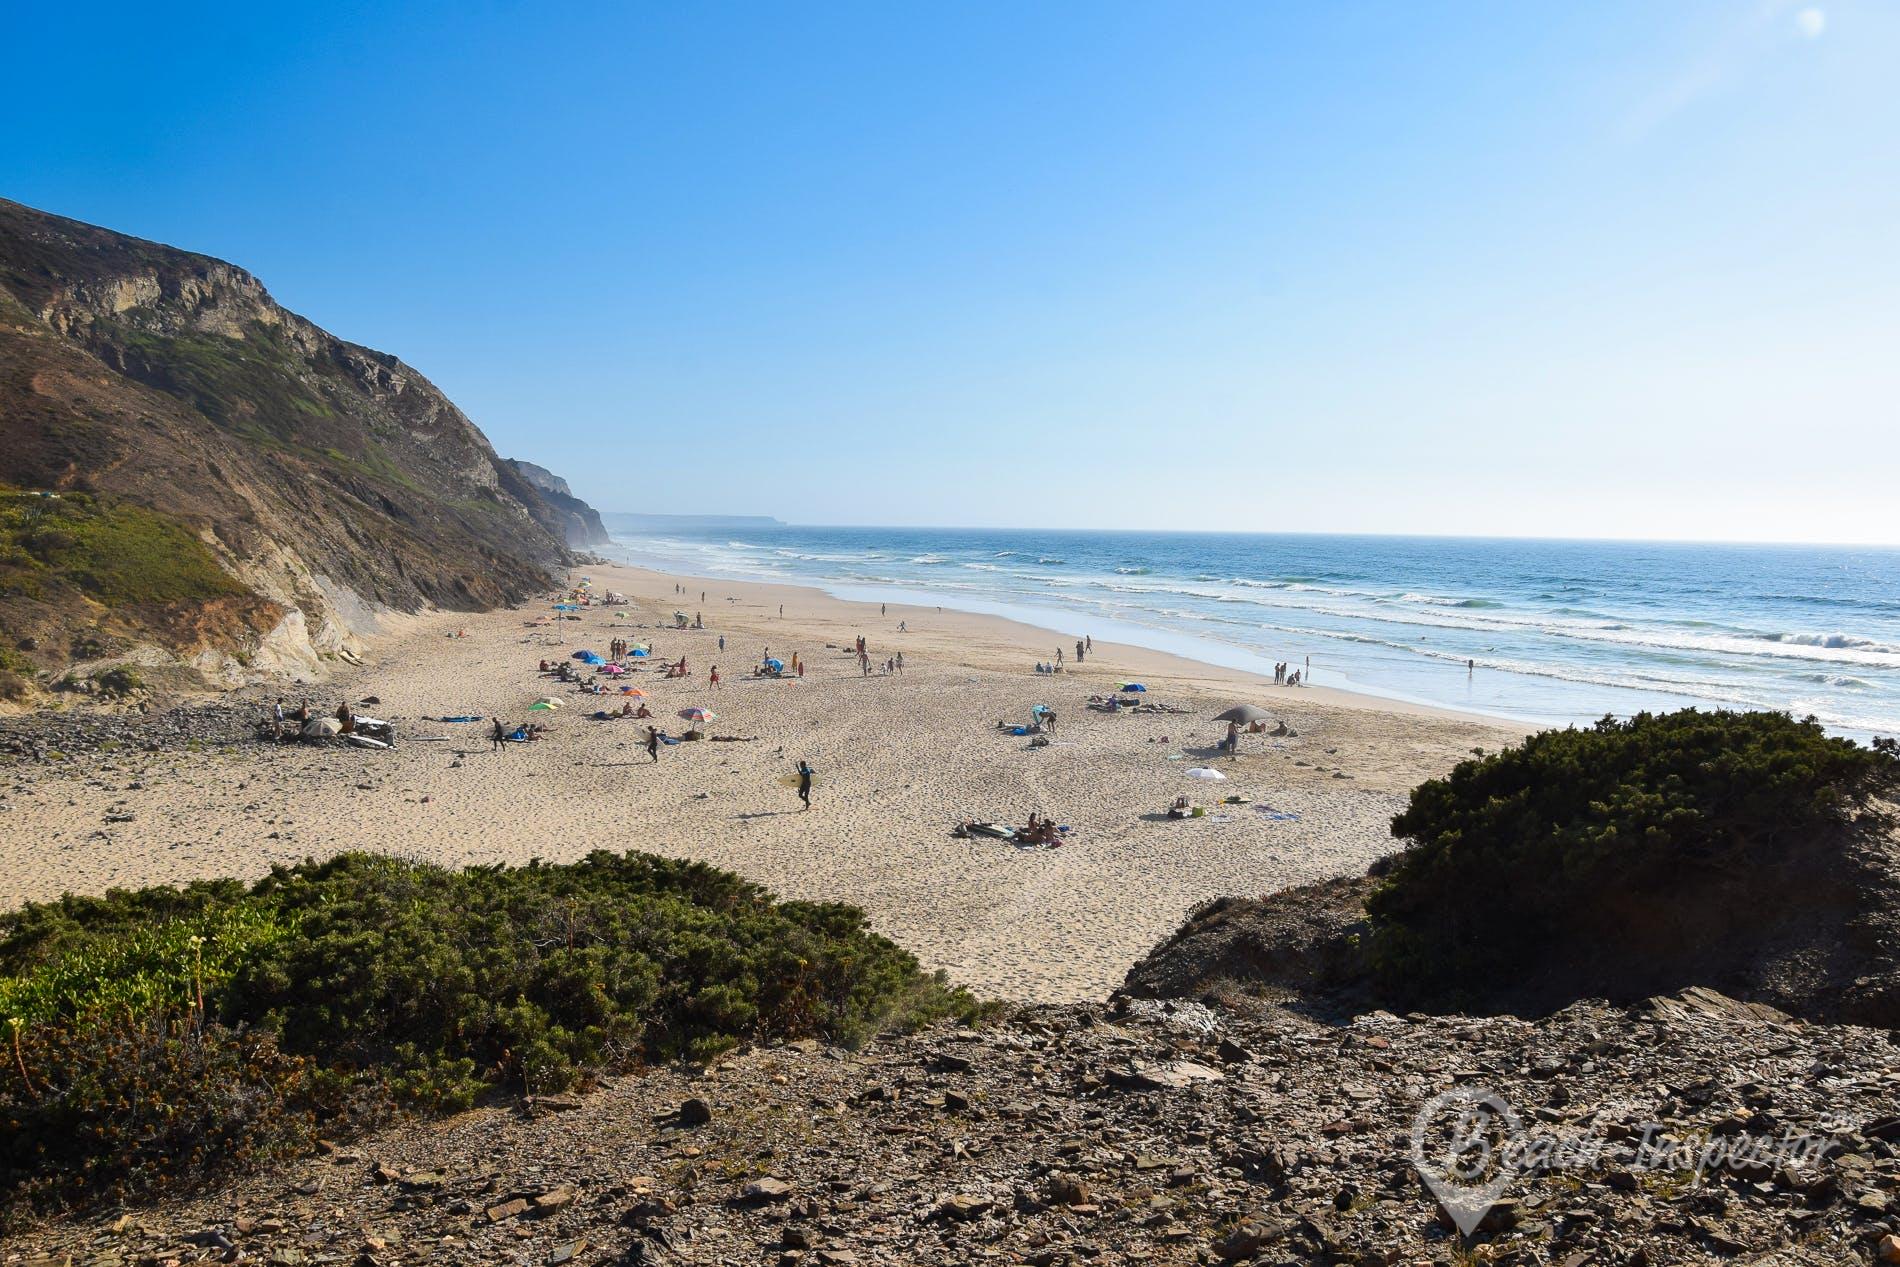 Strand Praia de Vale Figueiras, Algarve, Portugal